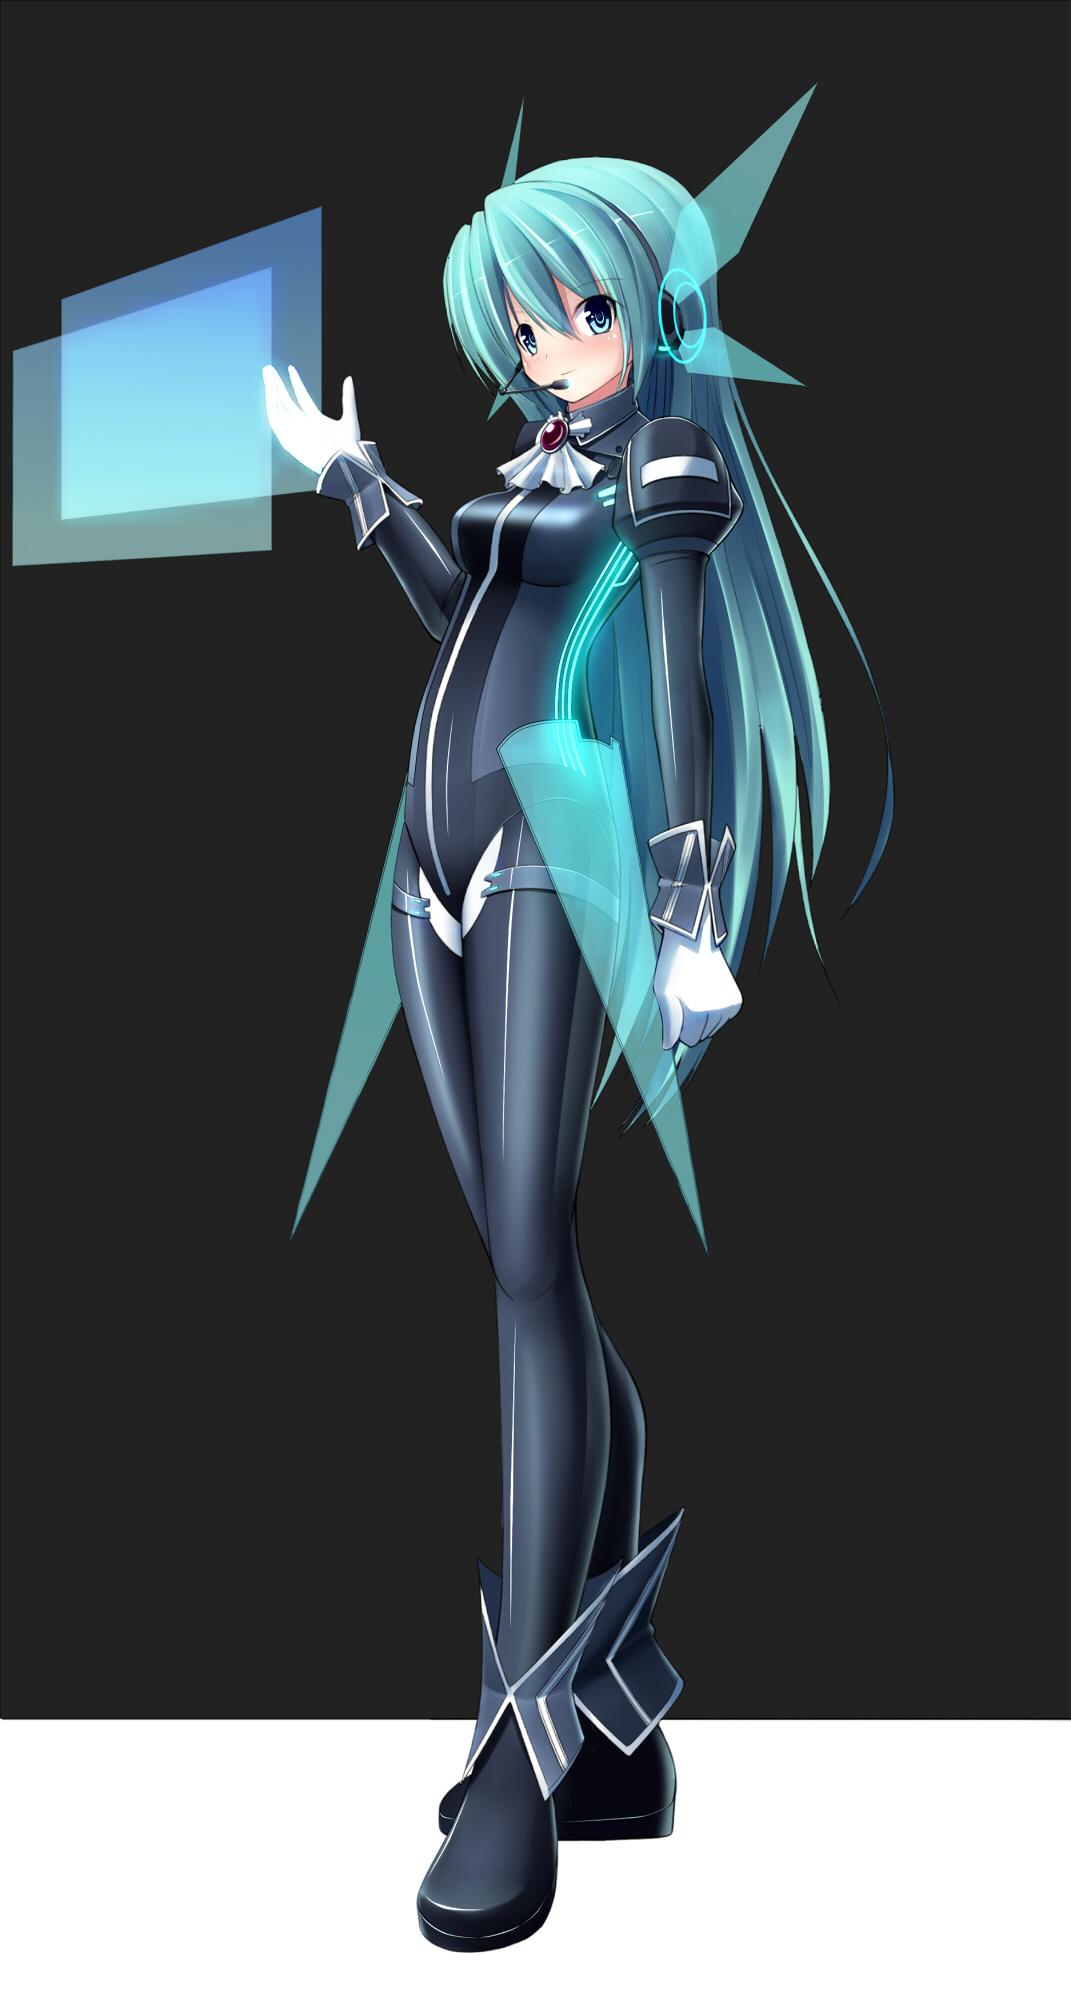 Project diva plug in zerochan anime image board - Hatsune miku project diva ...